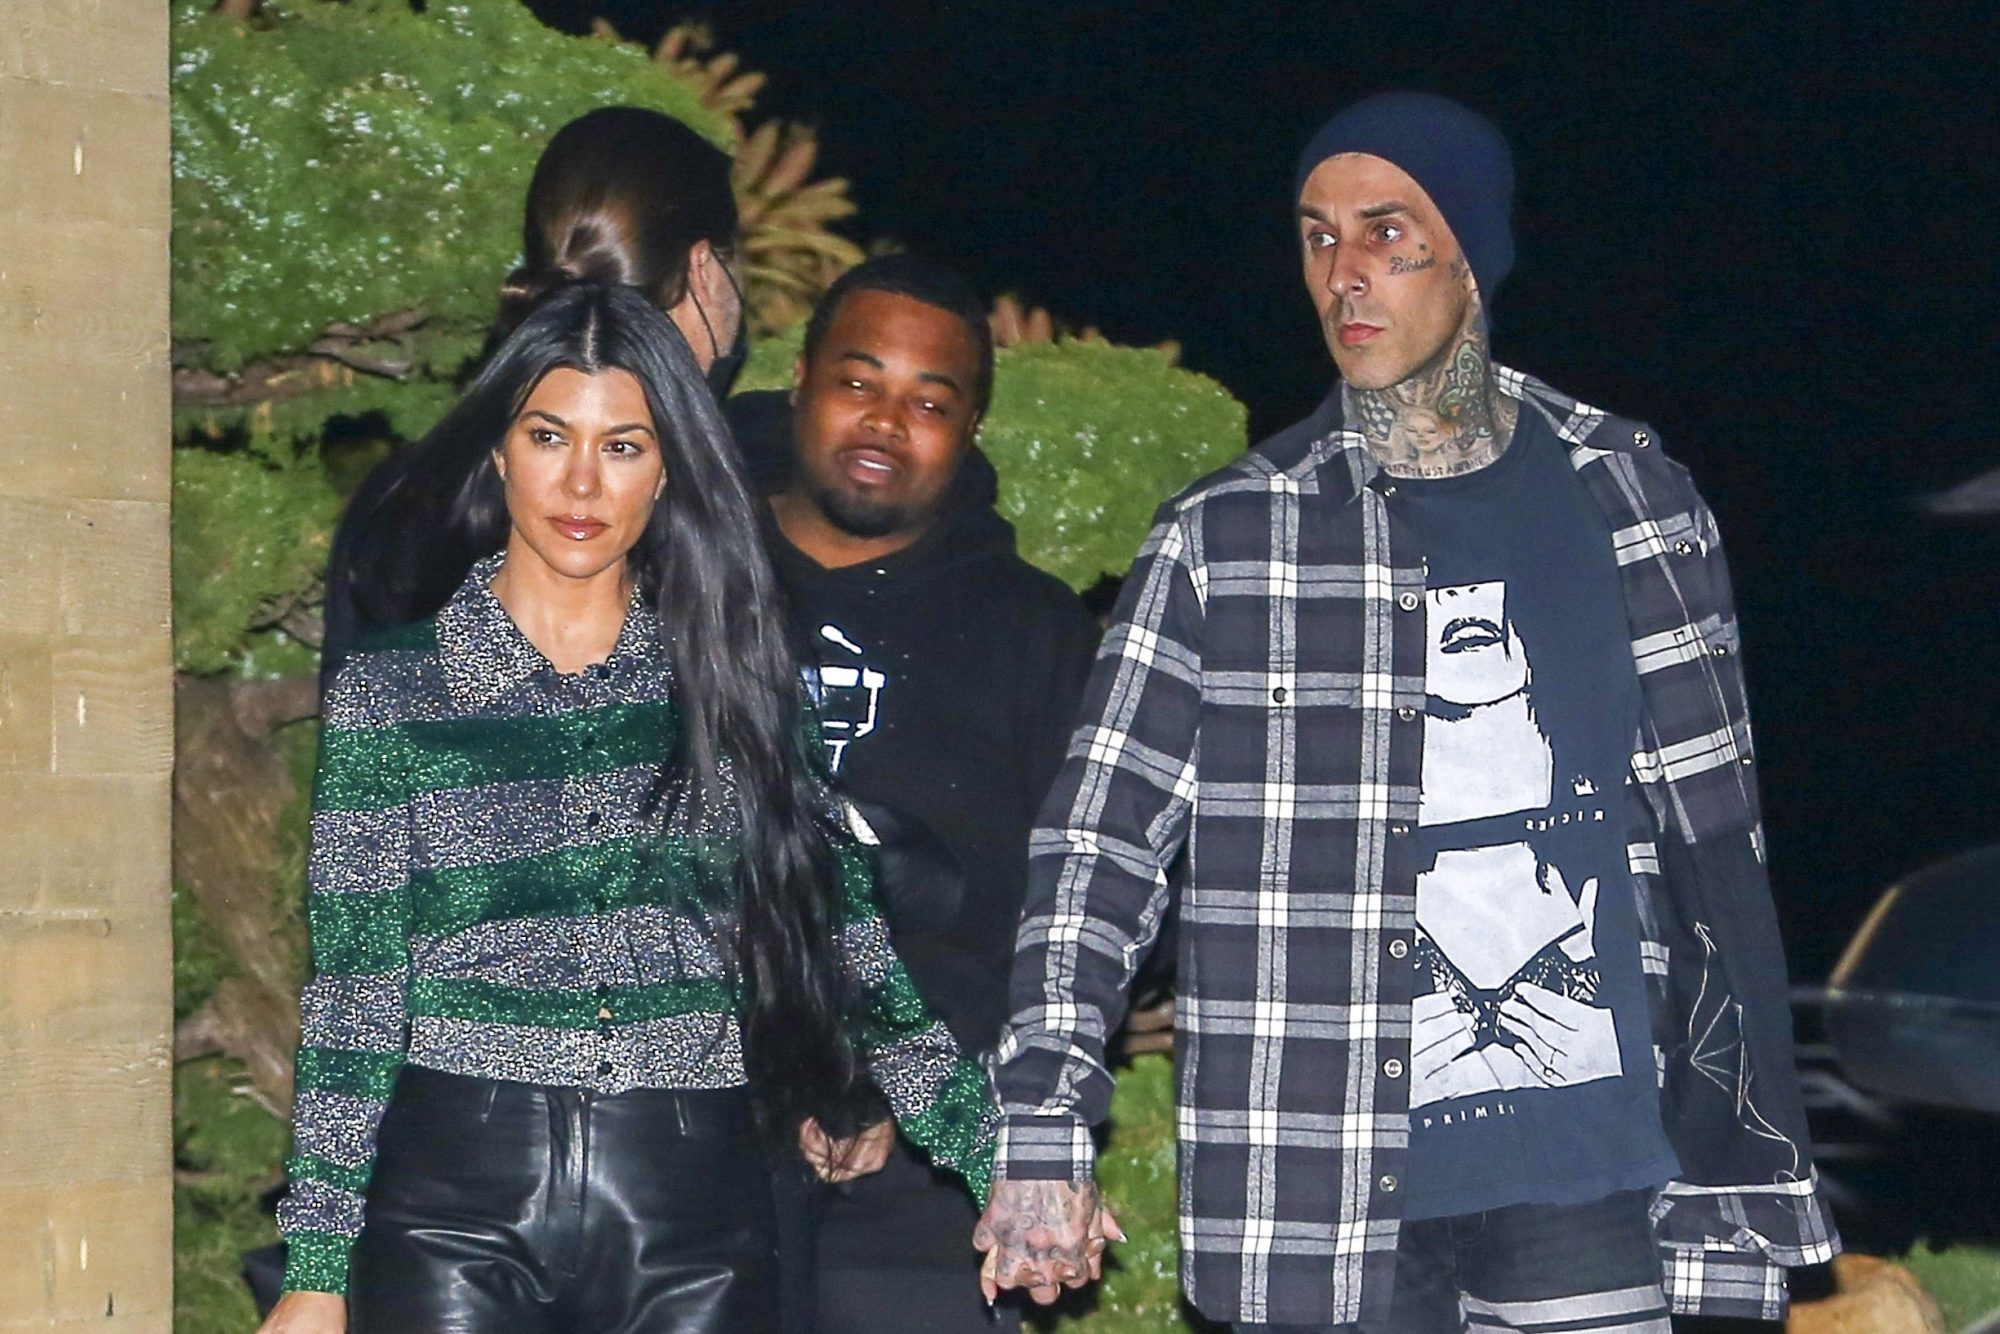 Kourtney Kardashian & Travis Barker Walk Hand in Hand after Romantic Dinner at Nobu